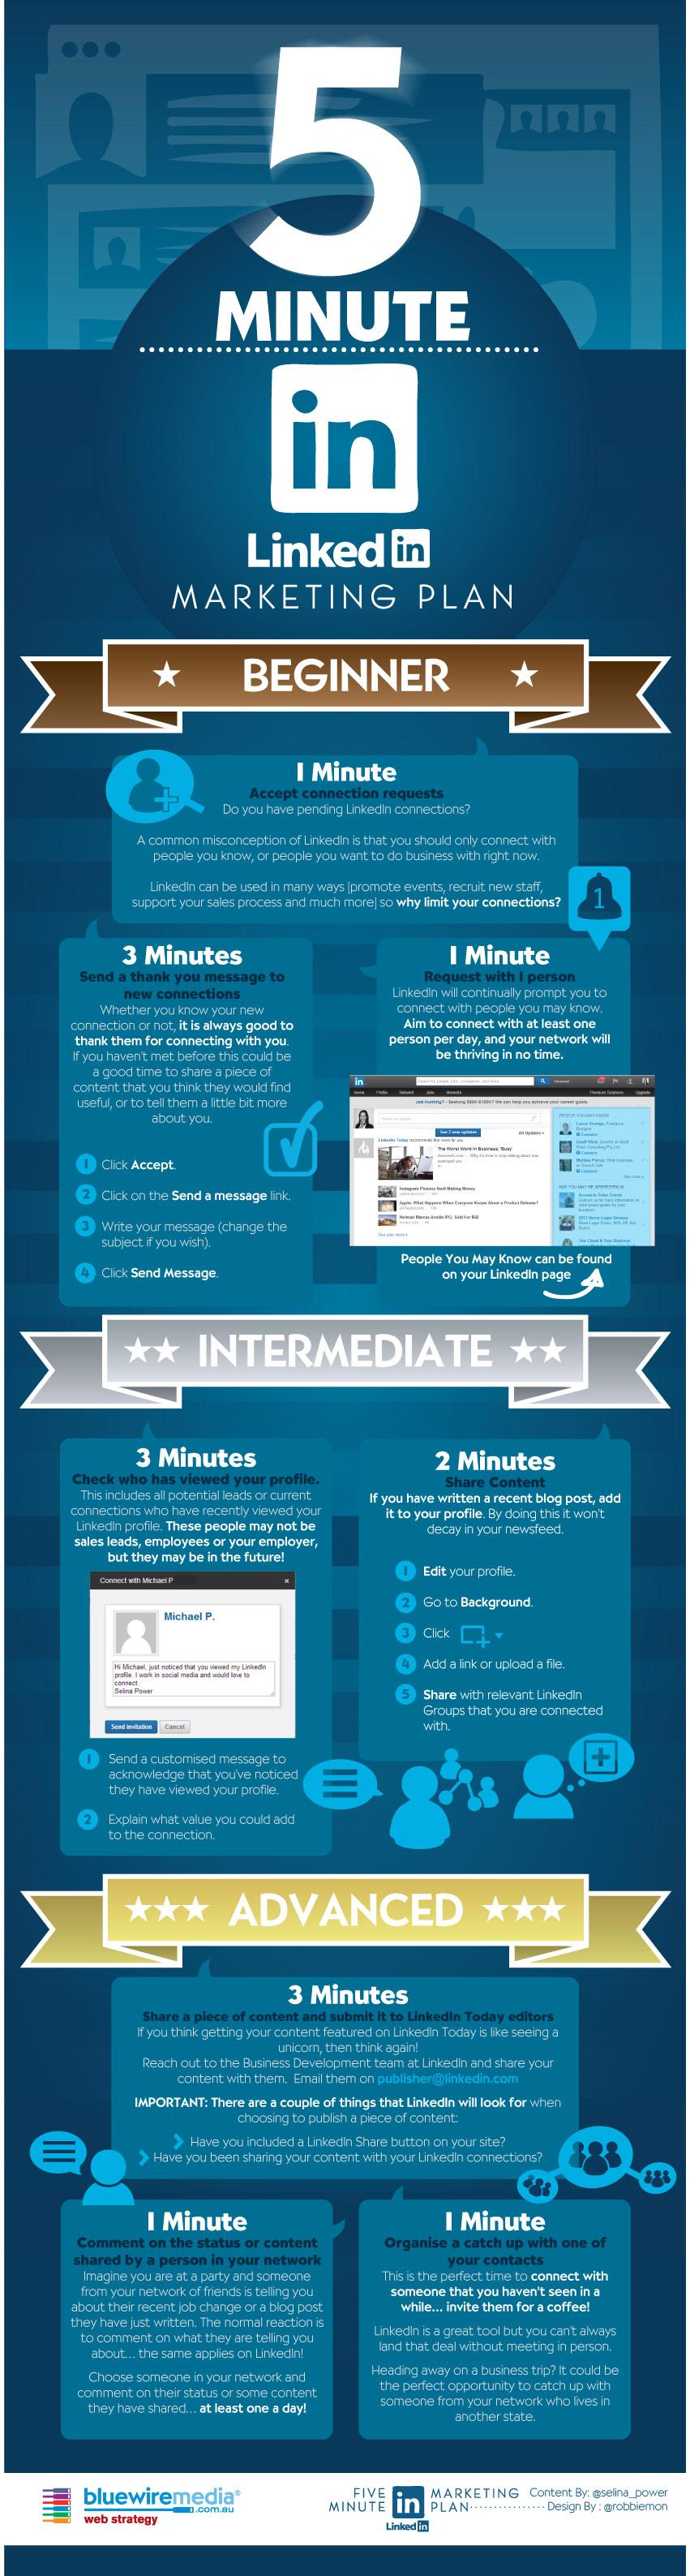 5min-LinkedIn-Infographic-Bluewire-Media